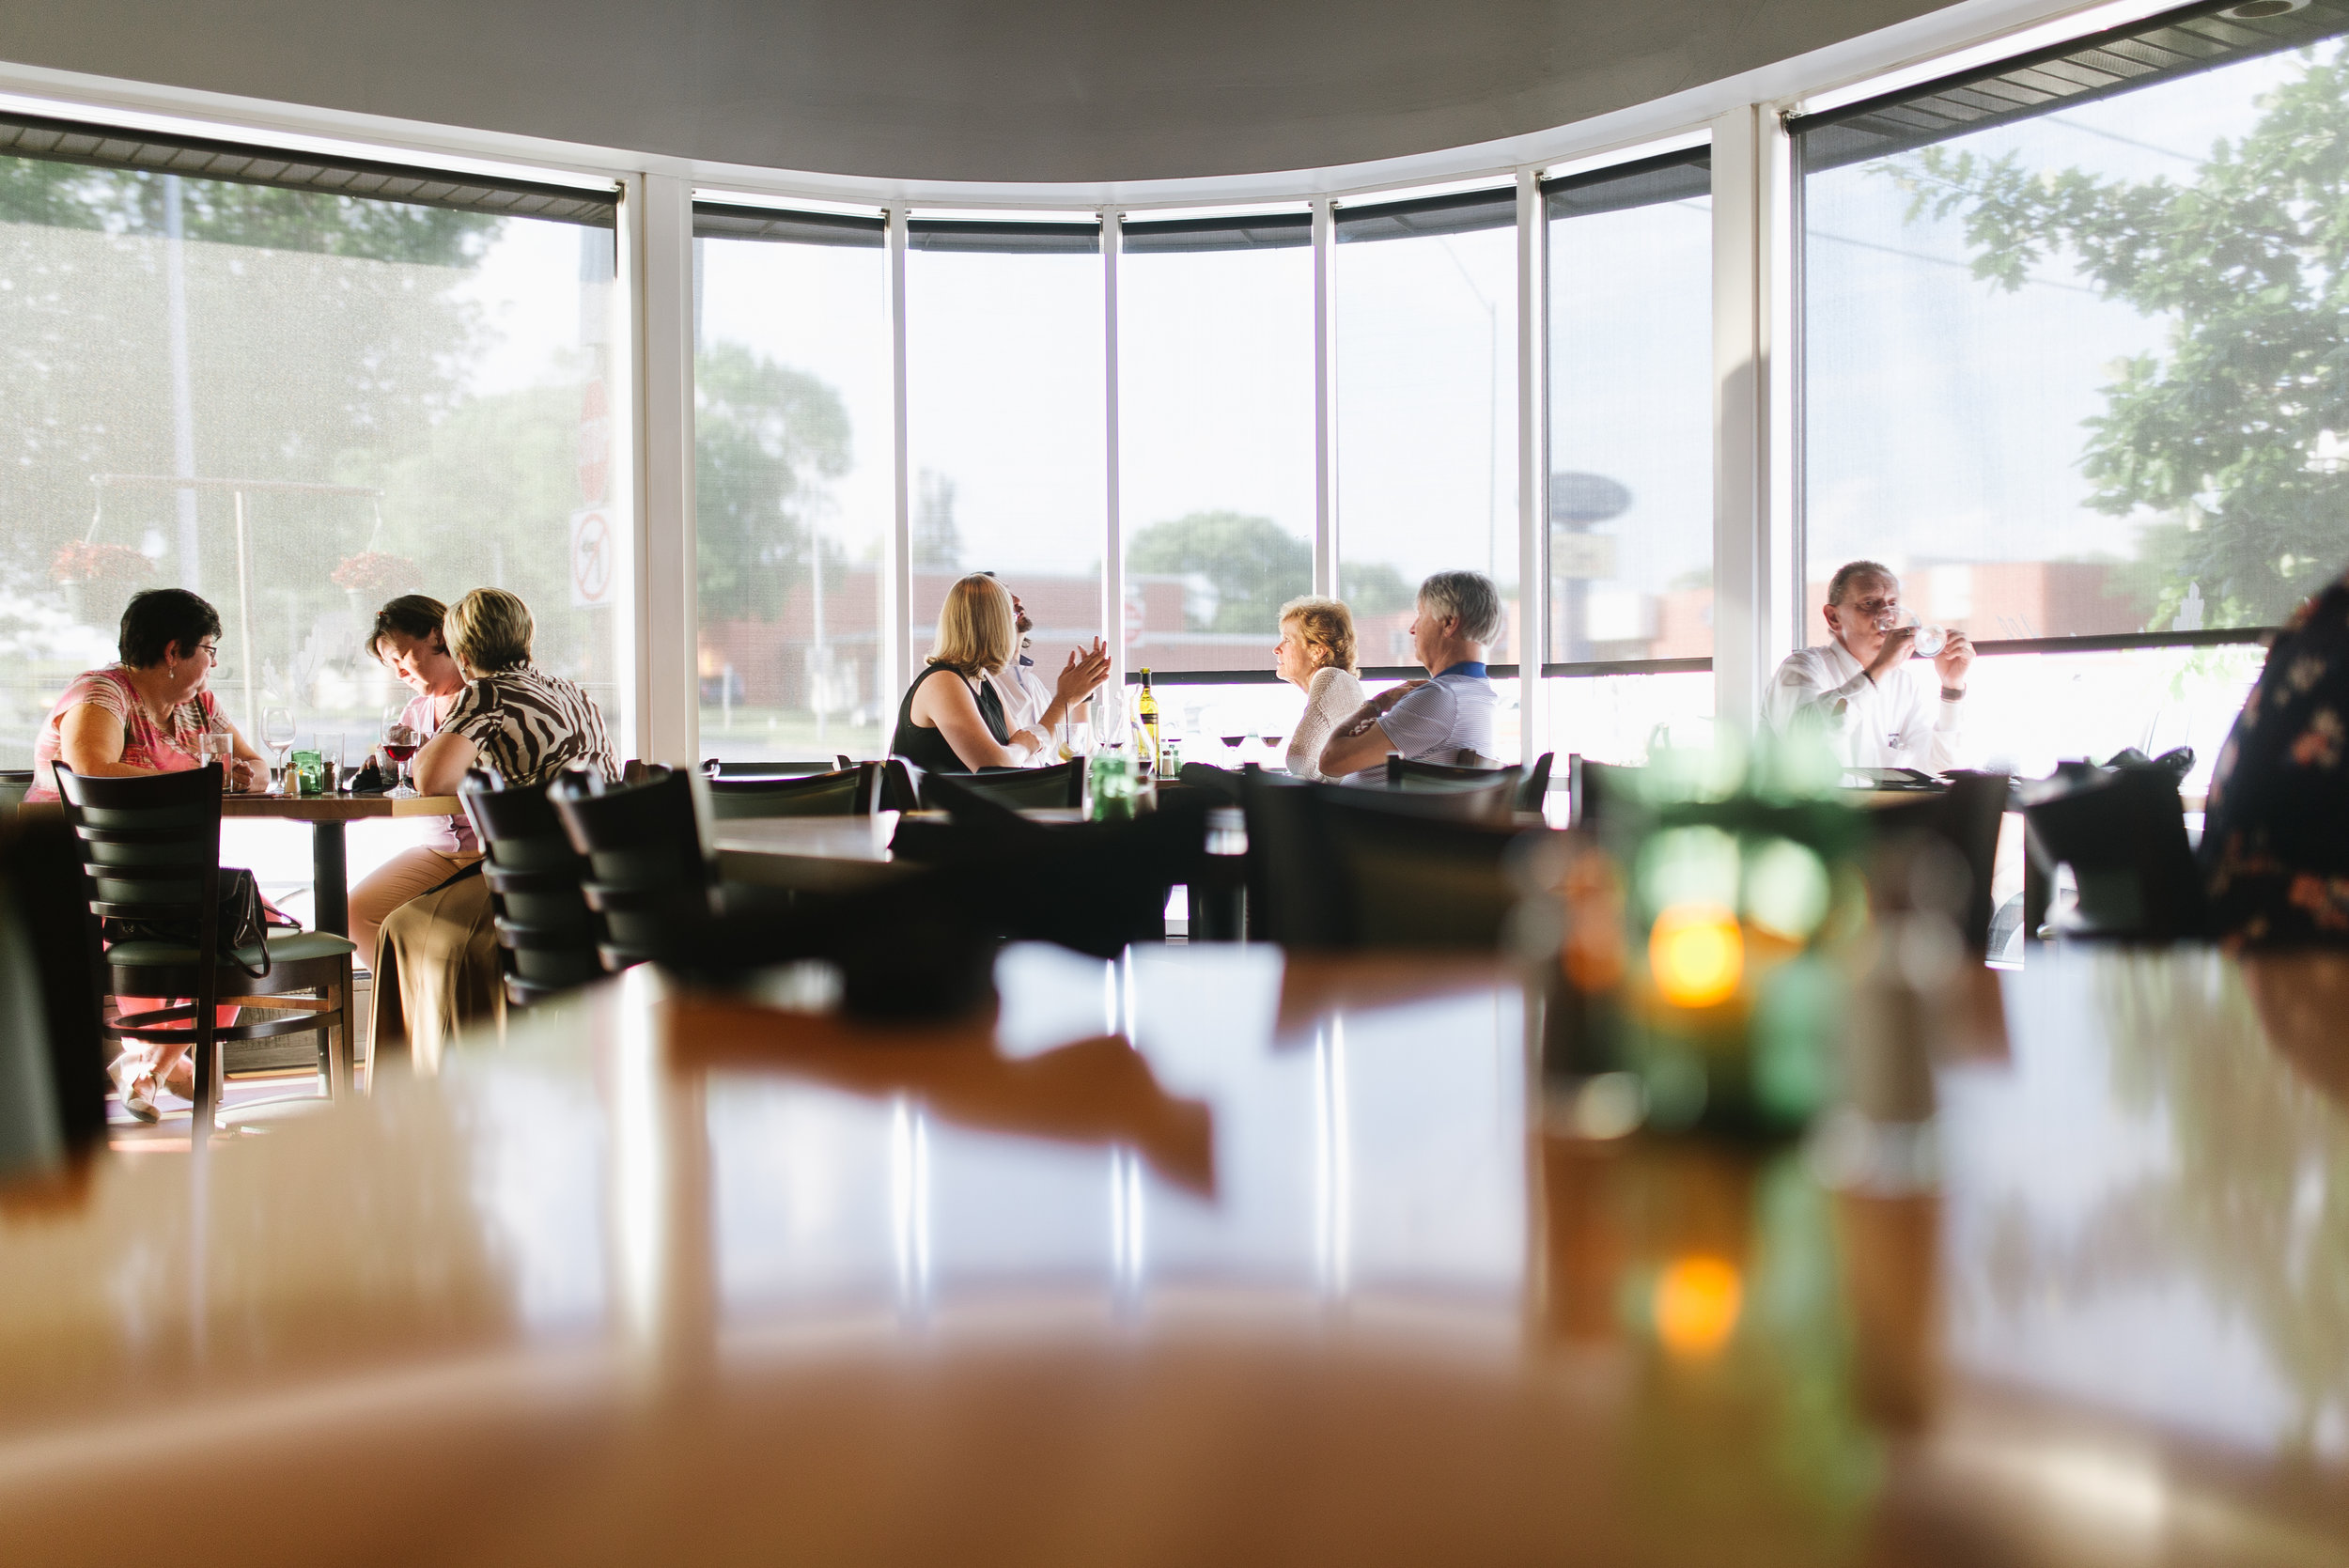 Alba Des Moines, Iowa Restaurant Table